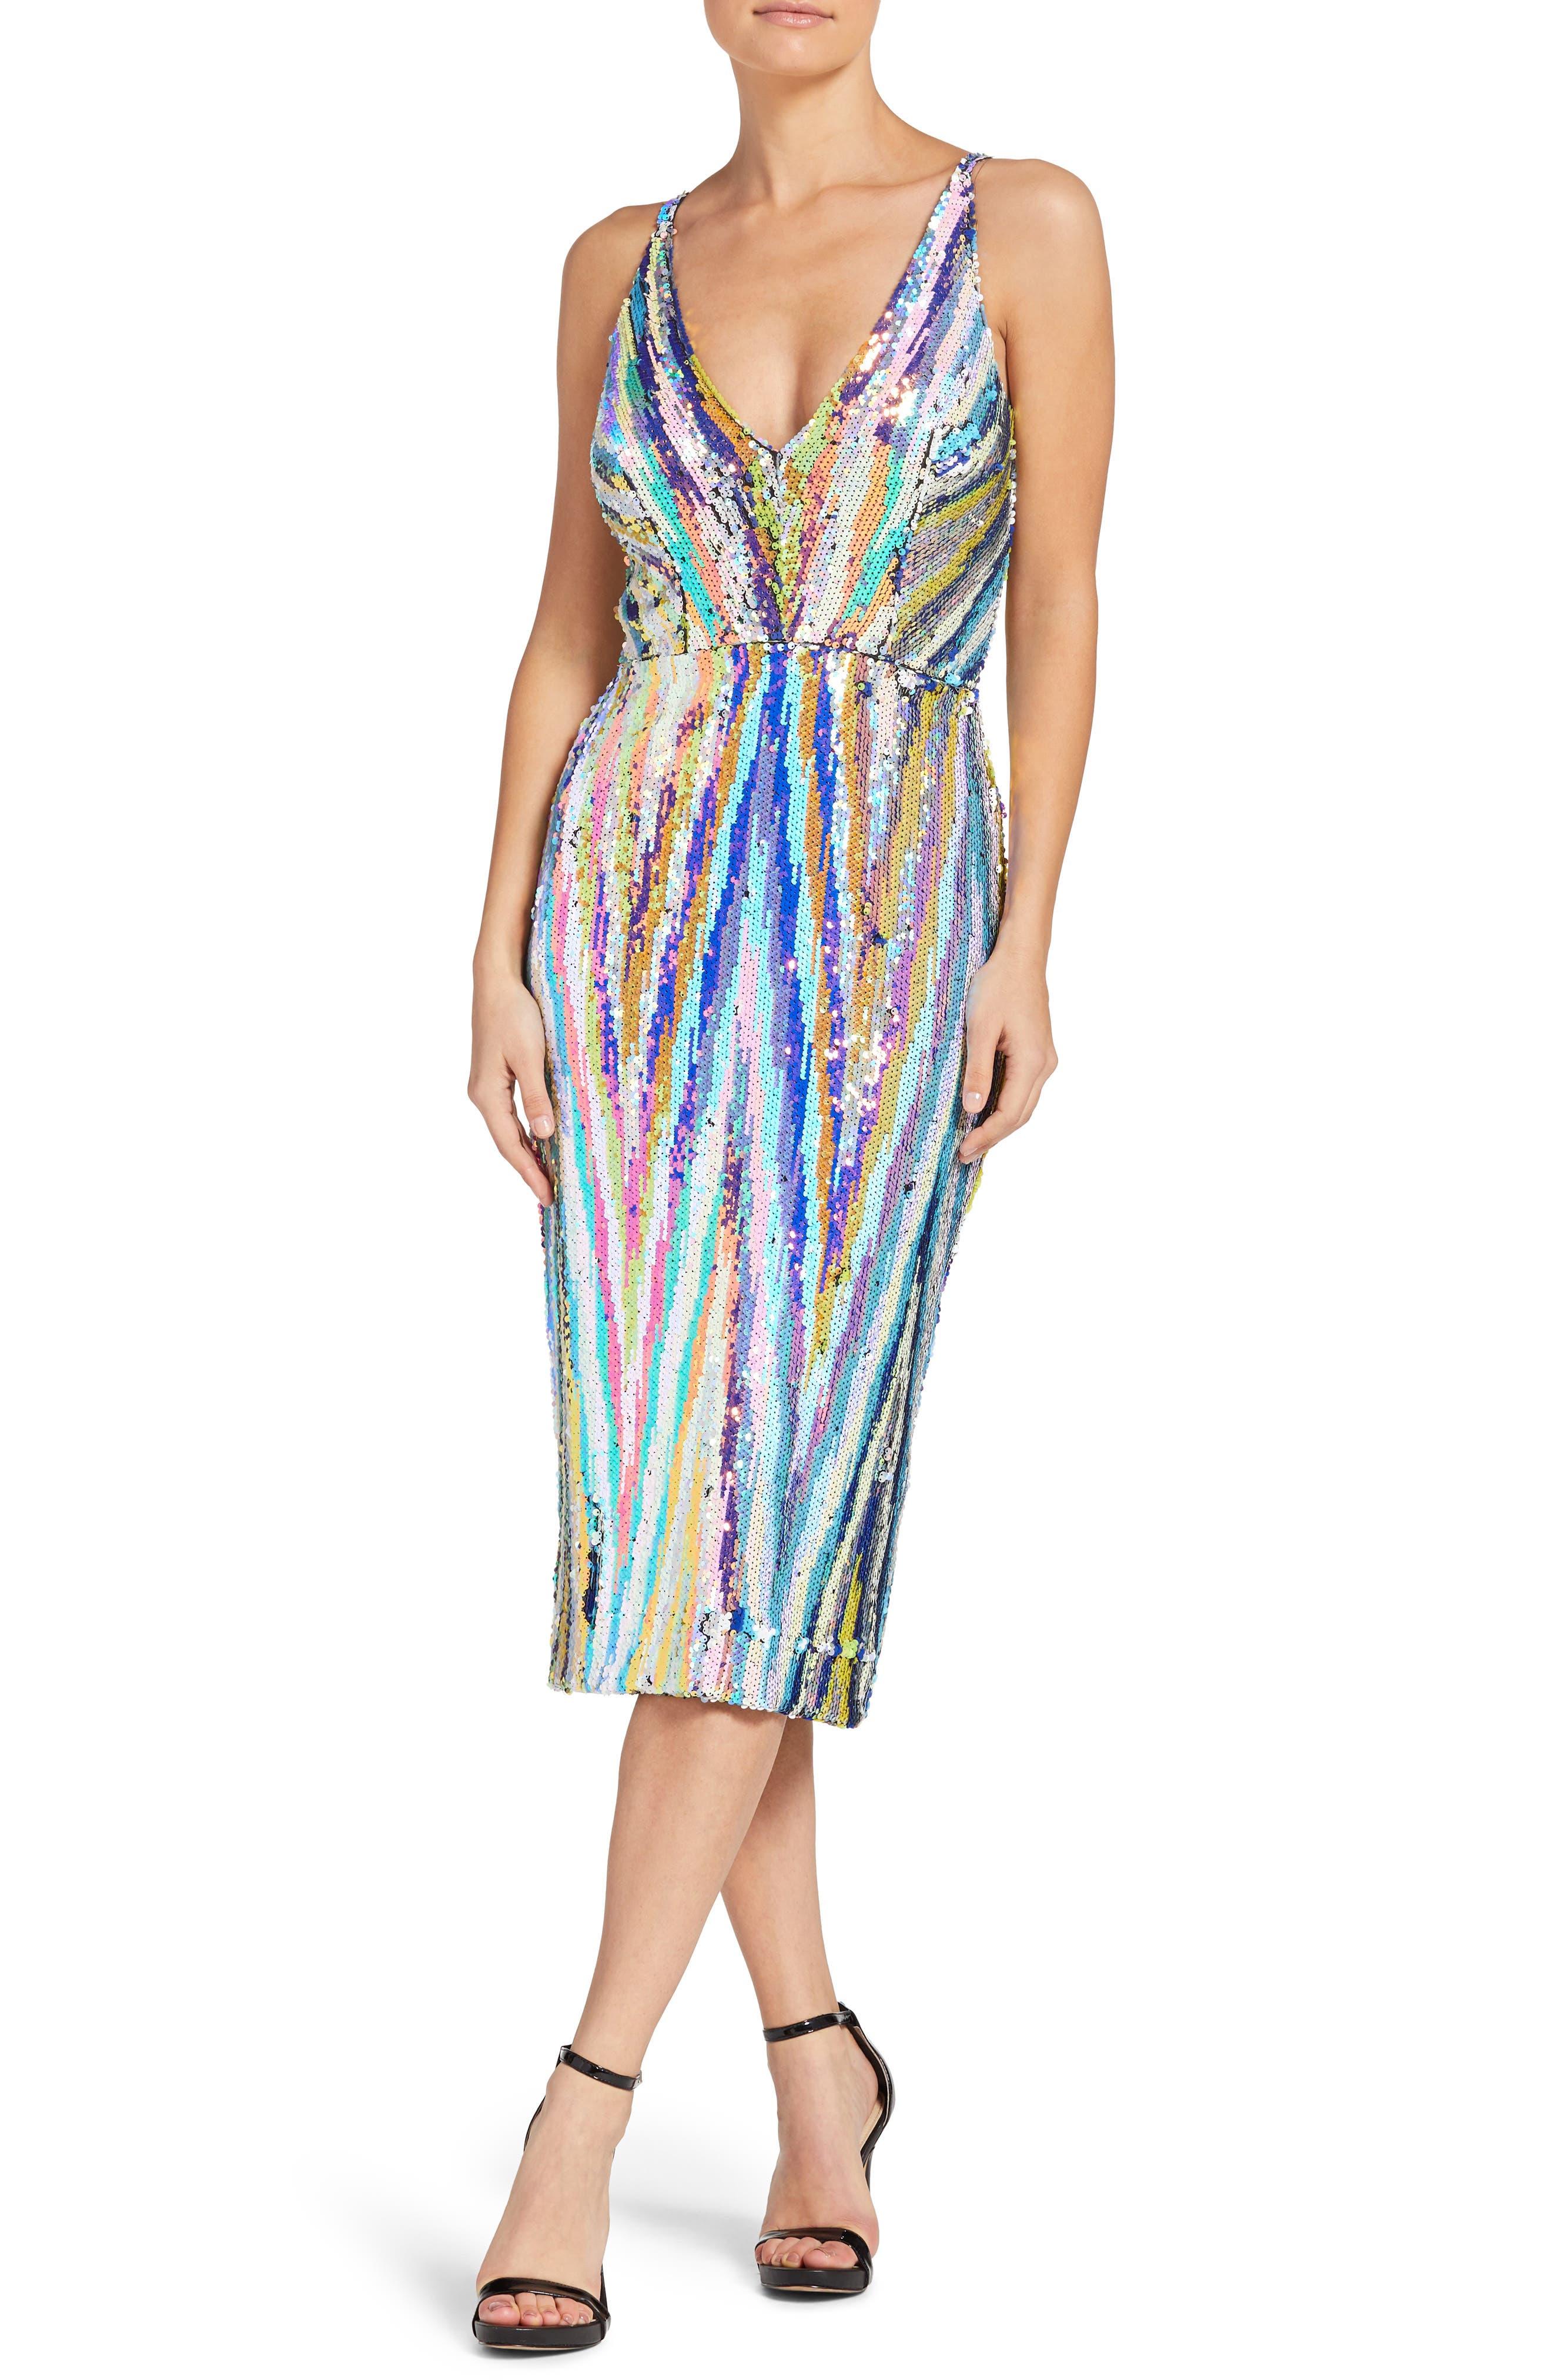 Margo Plunge Neck Sequin Dress,                         Main,                         color, OPAL MULTI